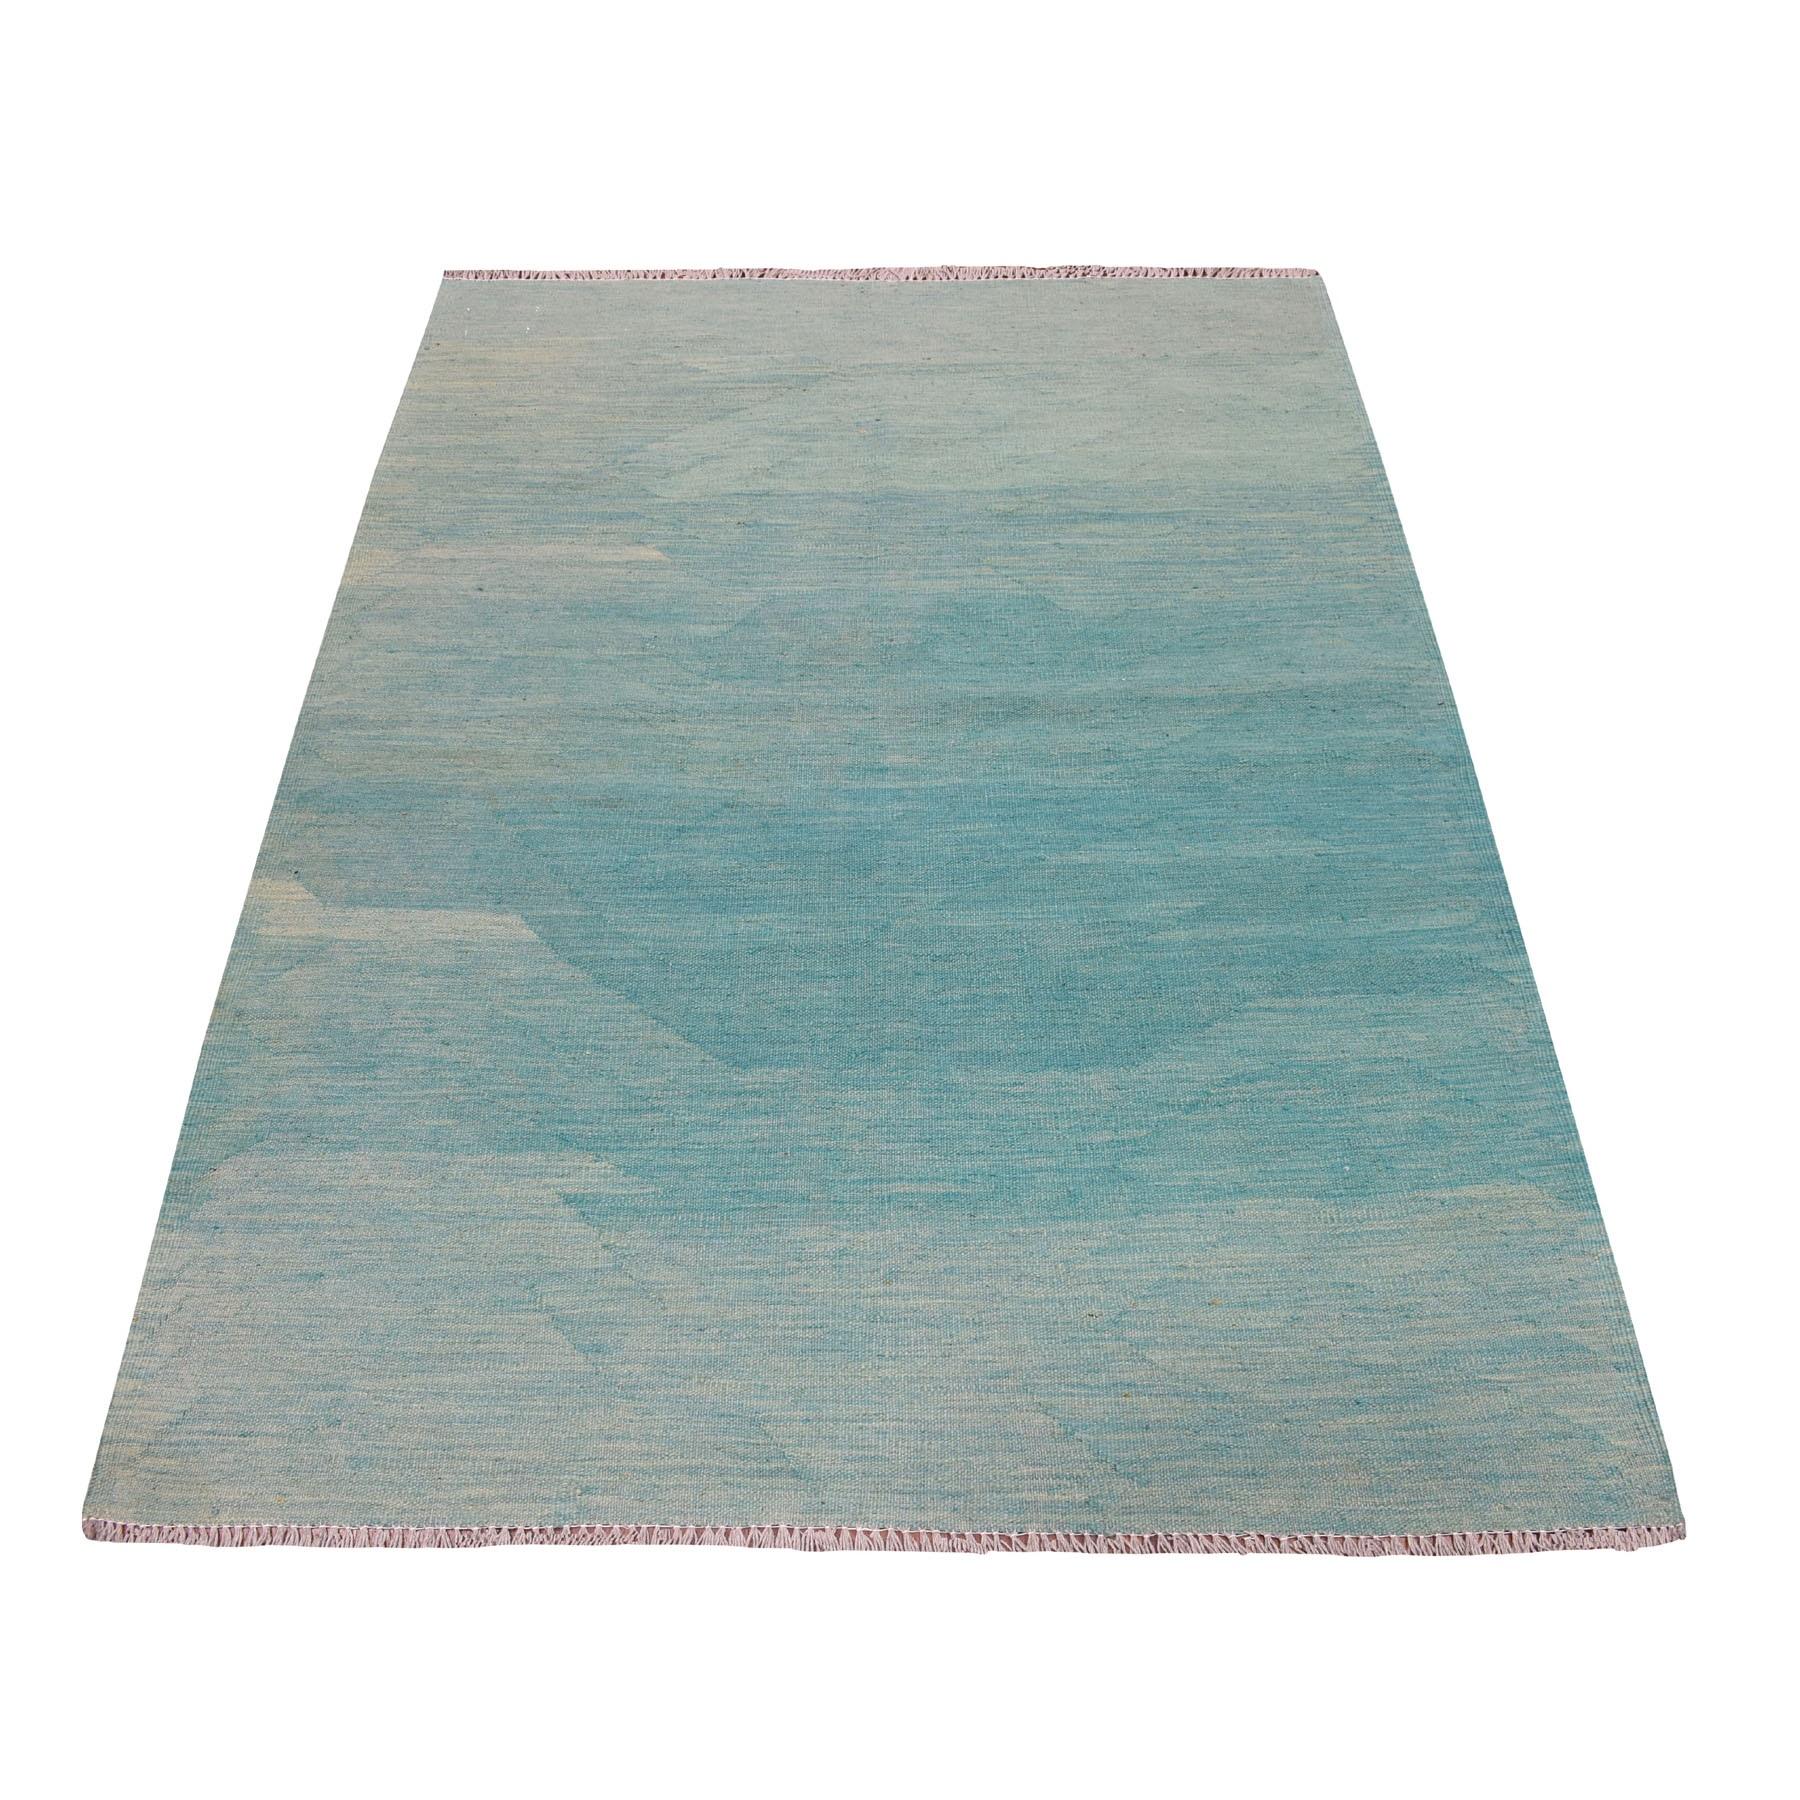 "4'X5'8"" Aquamarine Shades Flat Weave Kilim Pure Wool Hand Woven Oriental Rug moaedbc0"